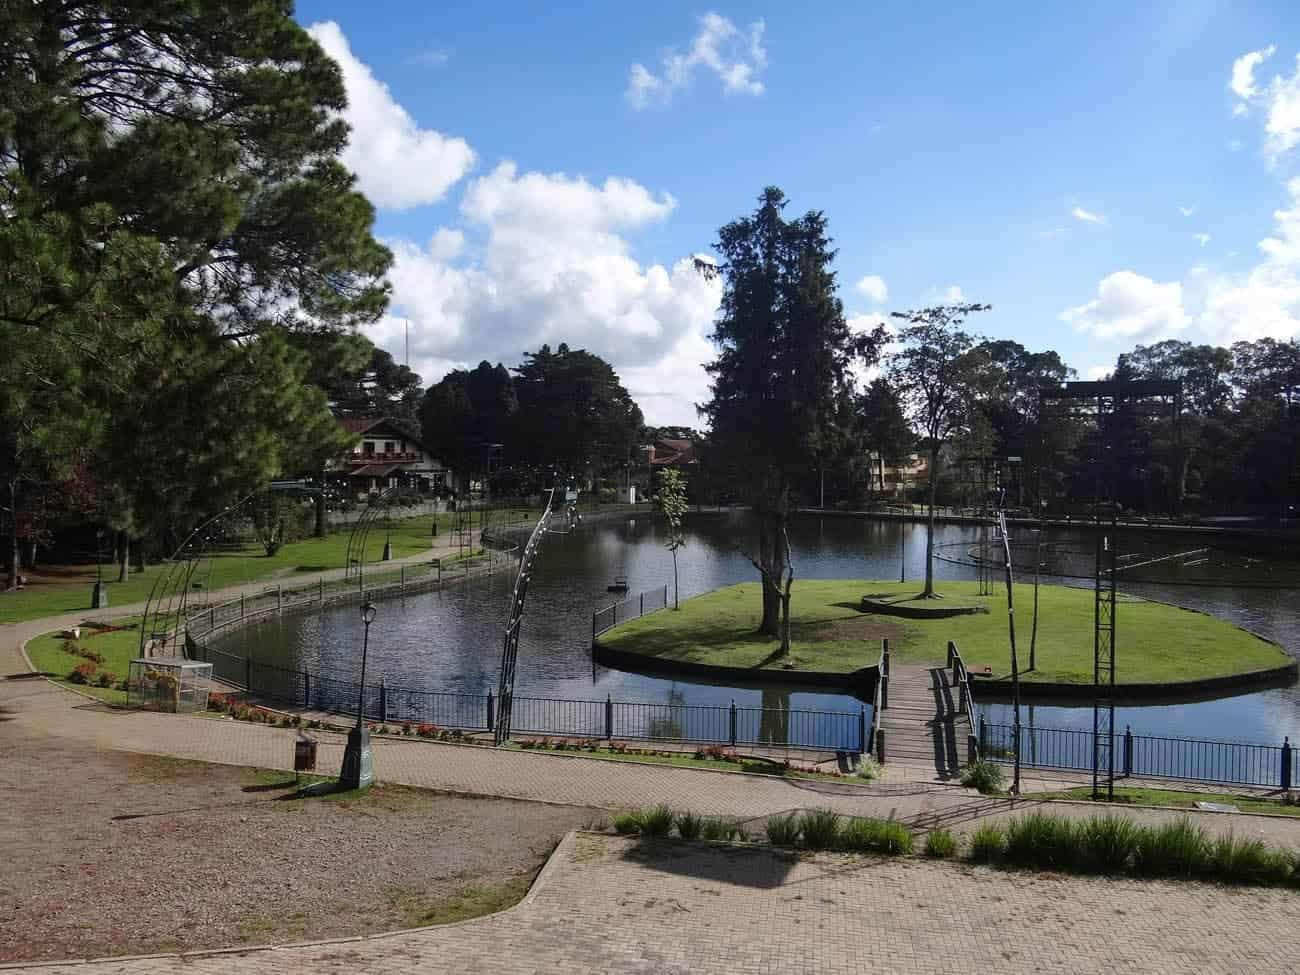 praça onde fica o lago